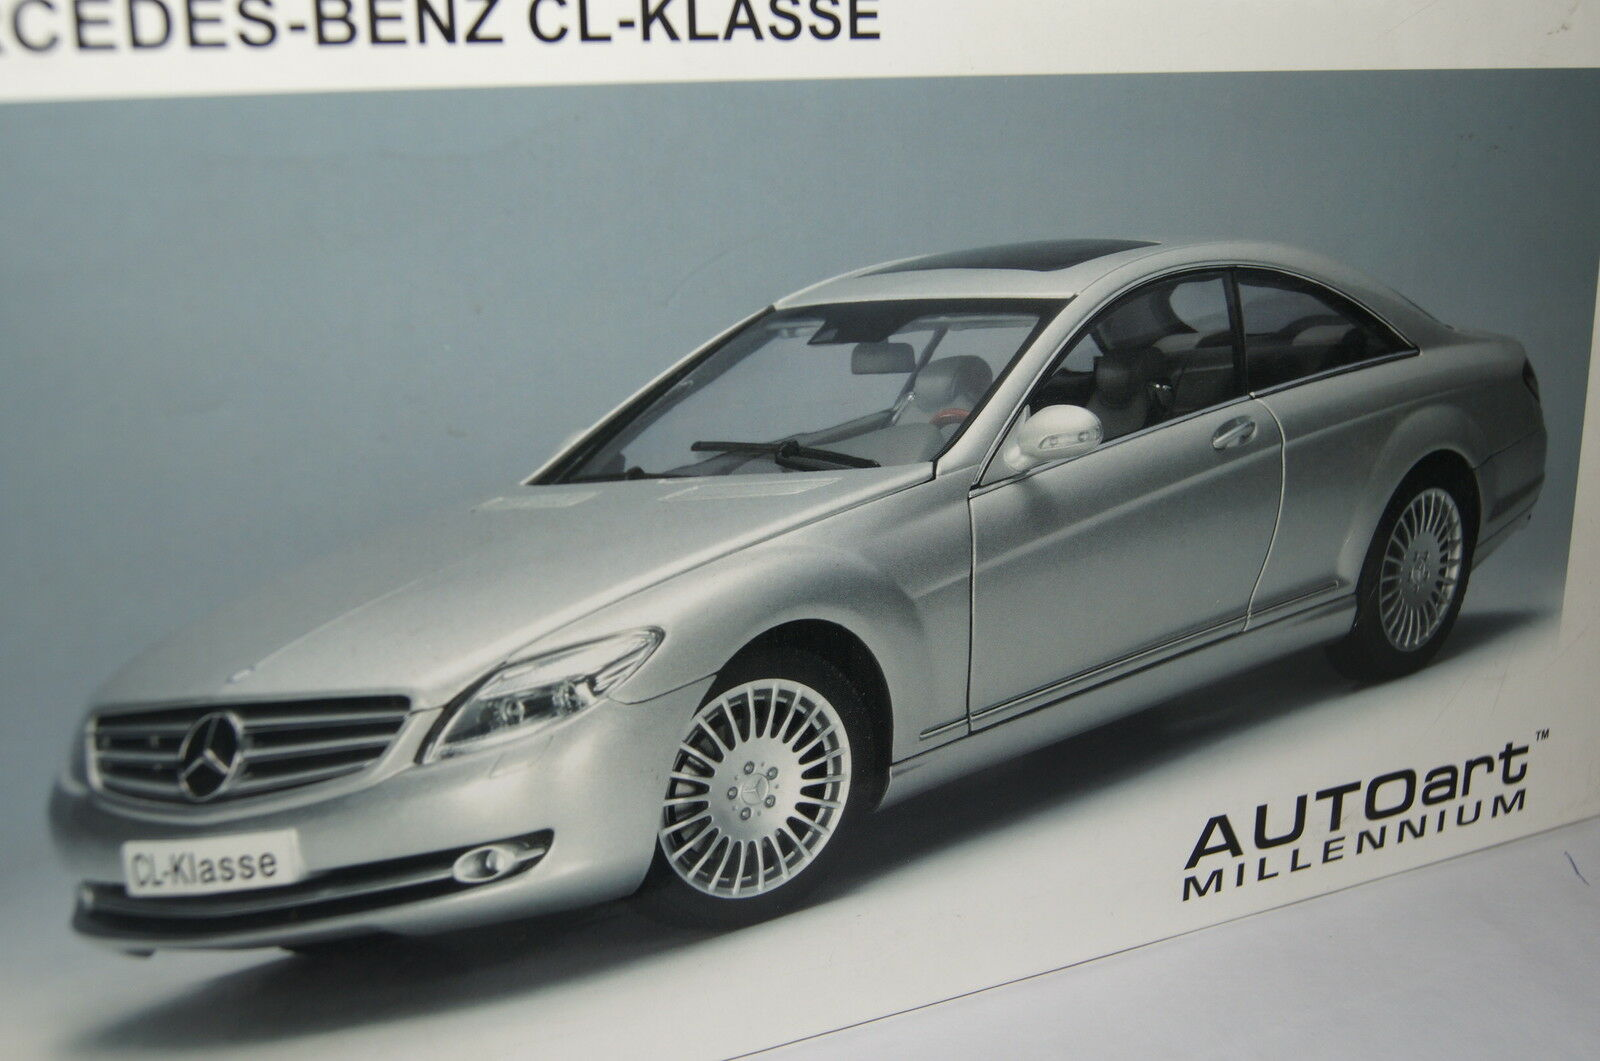 Mercedes CL-clase plata 1 18 Autoart nuevo & OVP 76164